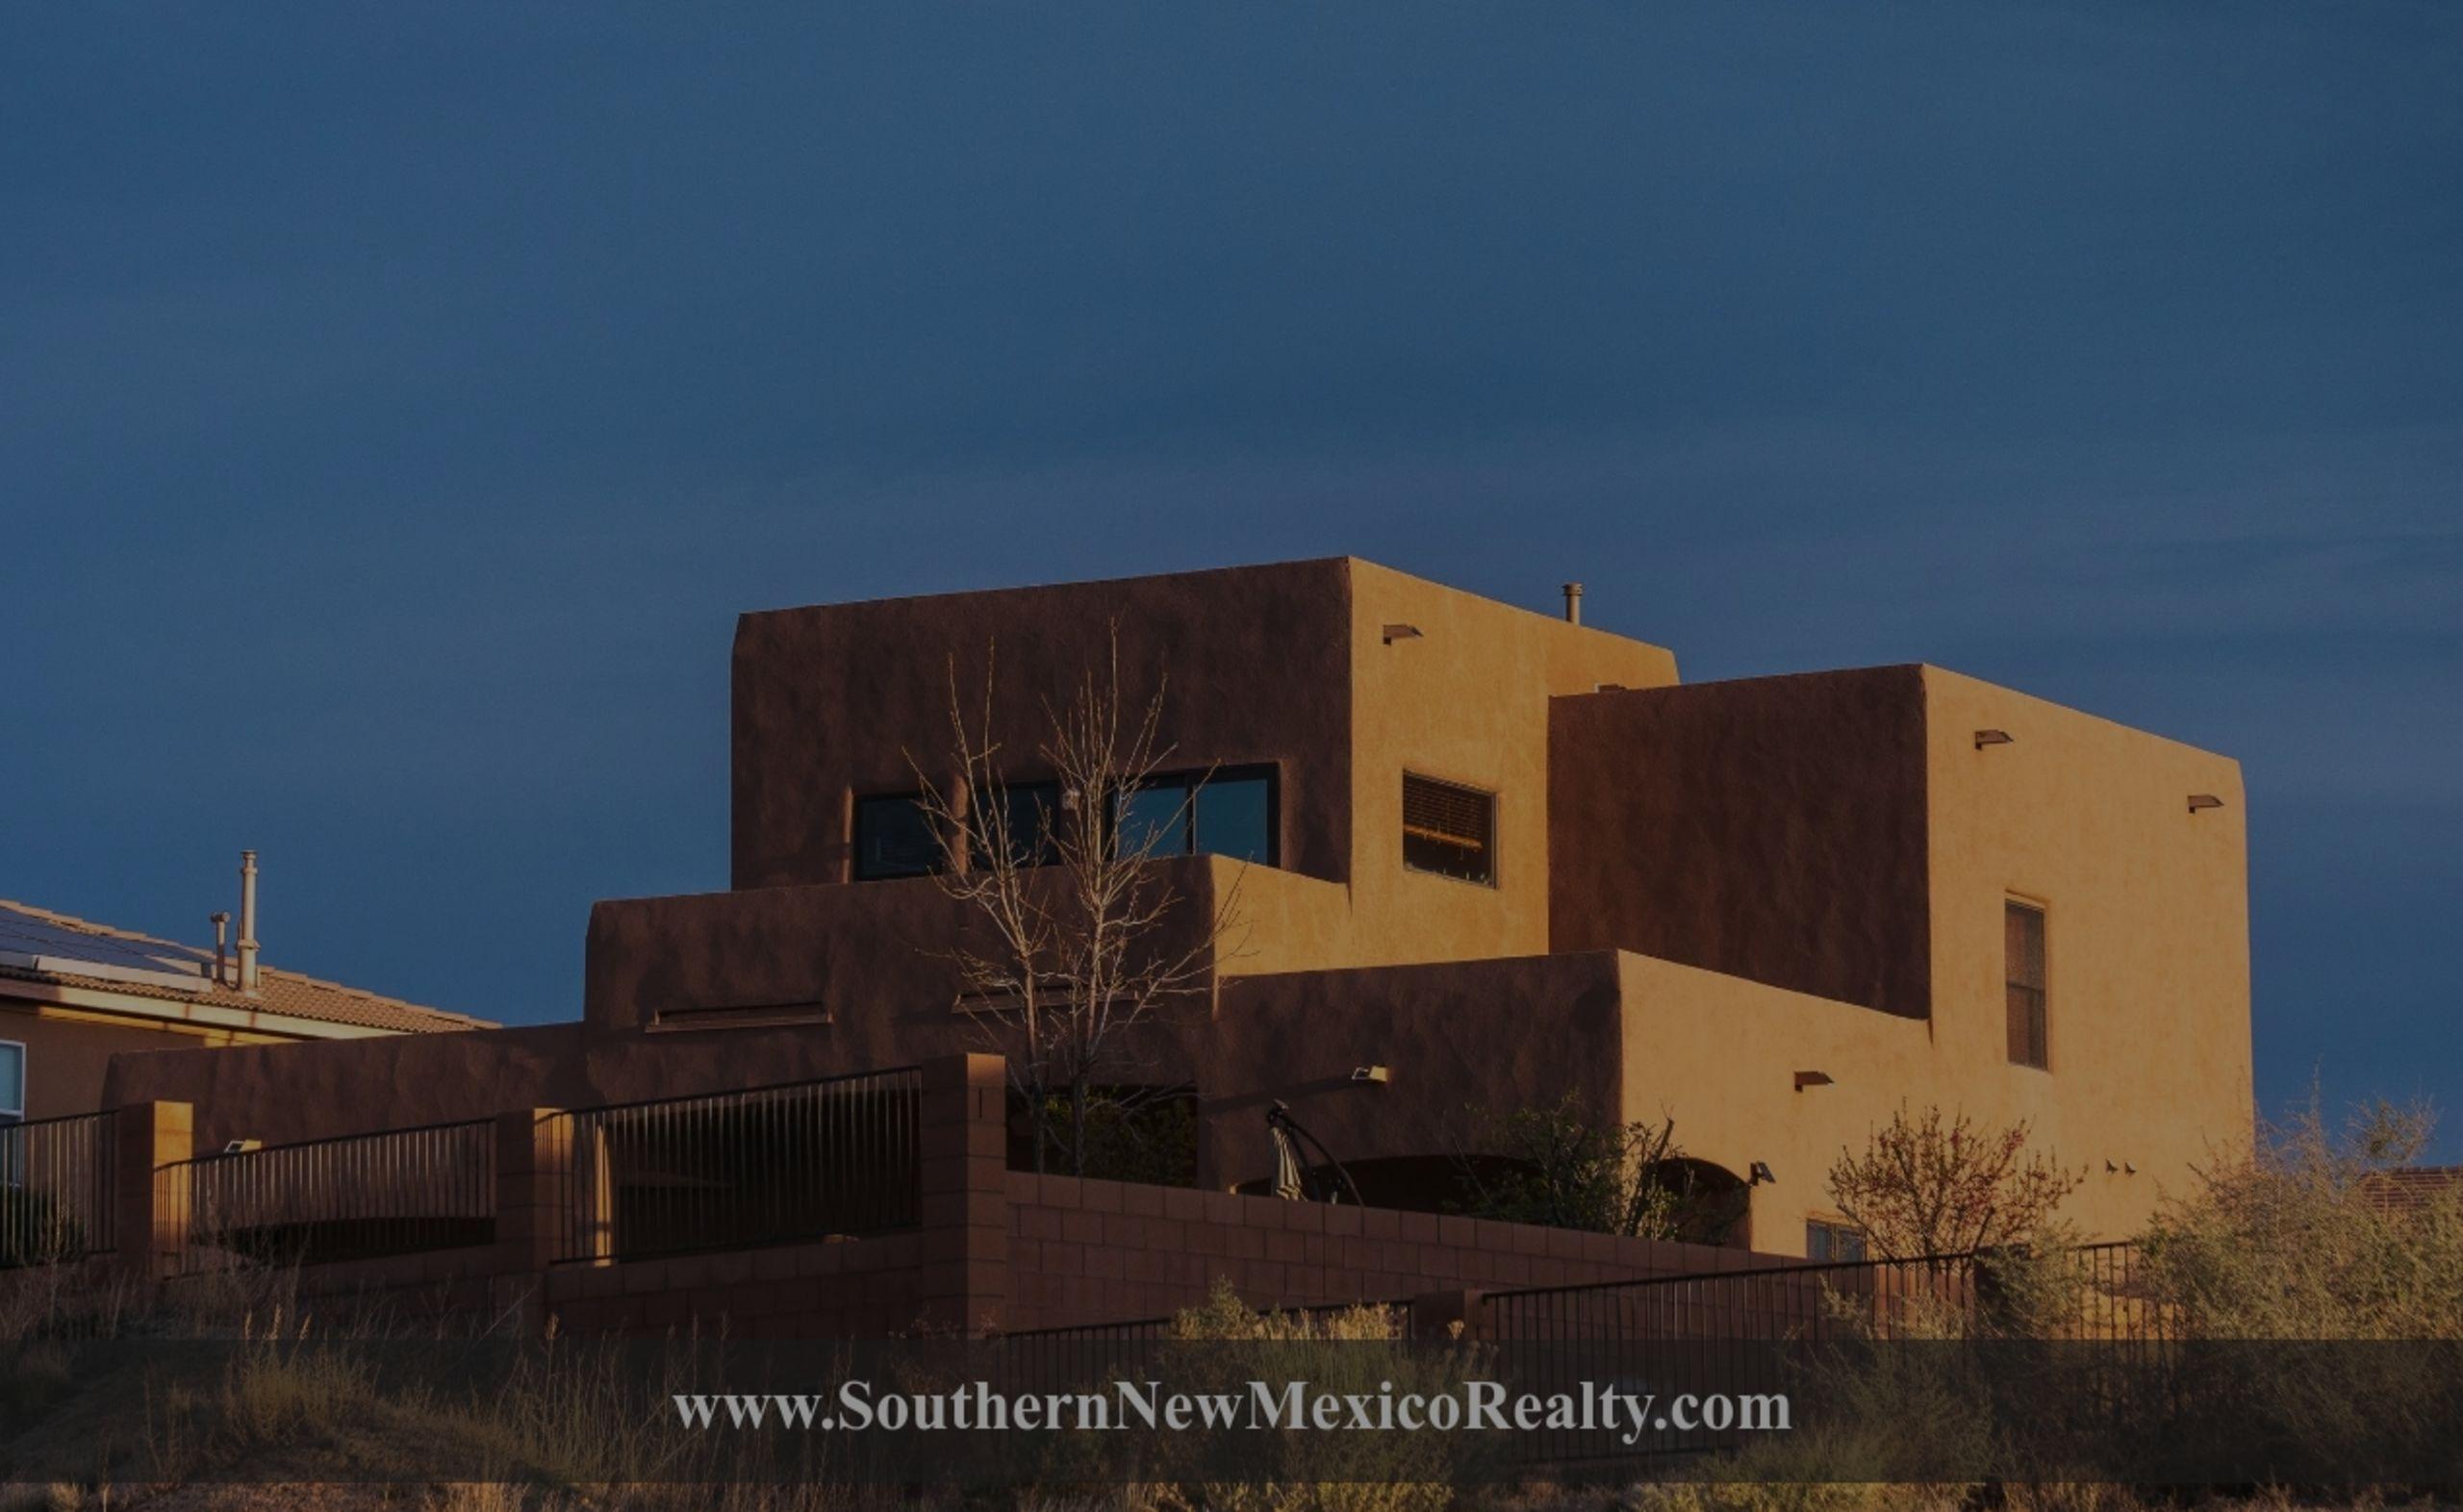 Homes for Sale in Ruidoso NM